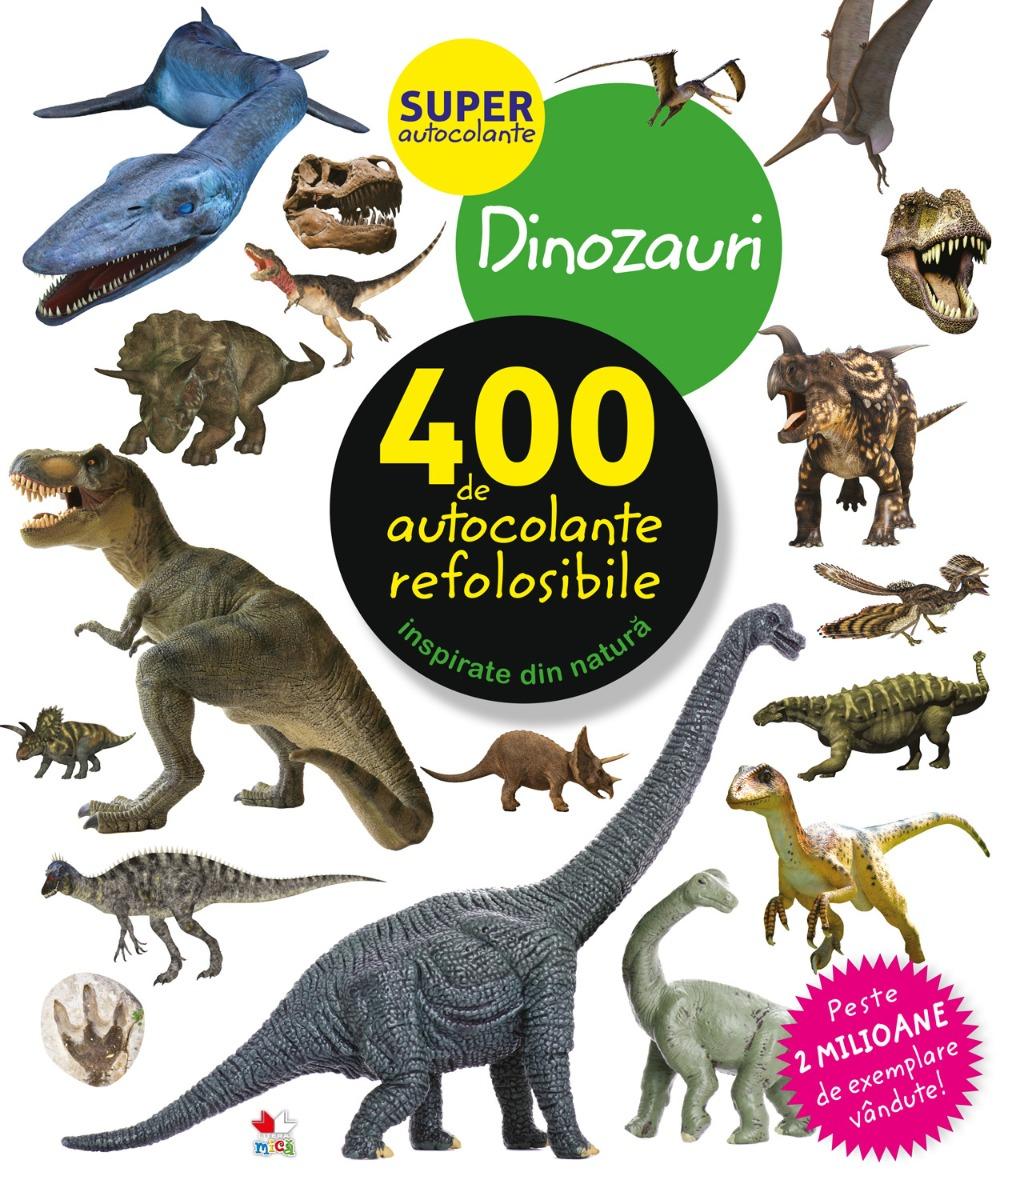 Autocolante refolosibile, dinozauri - Editura Litera